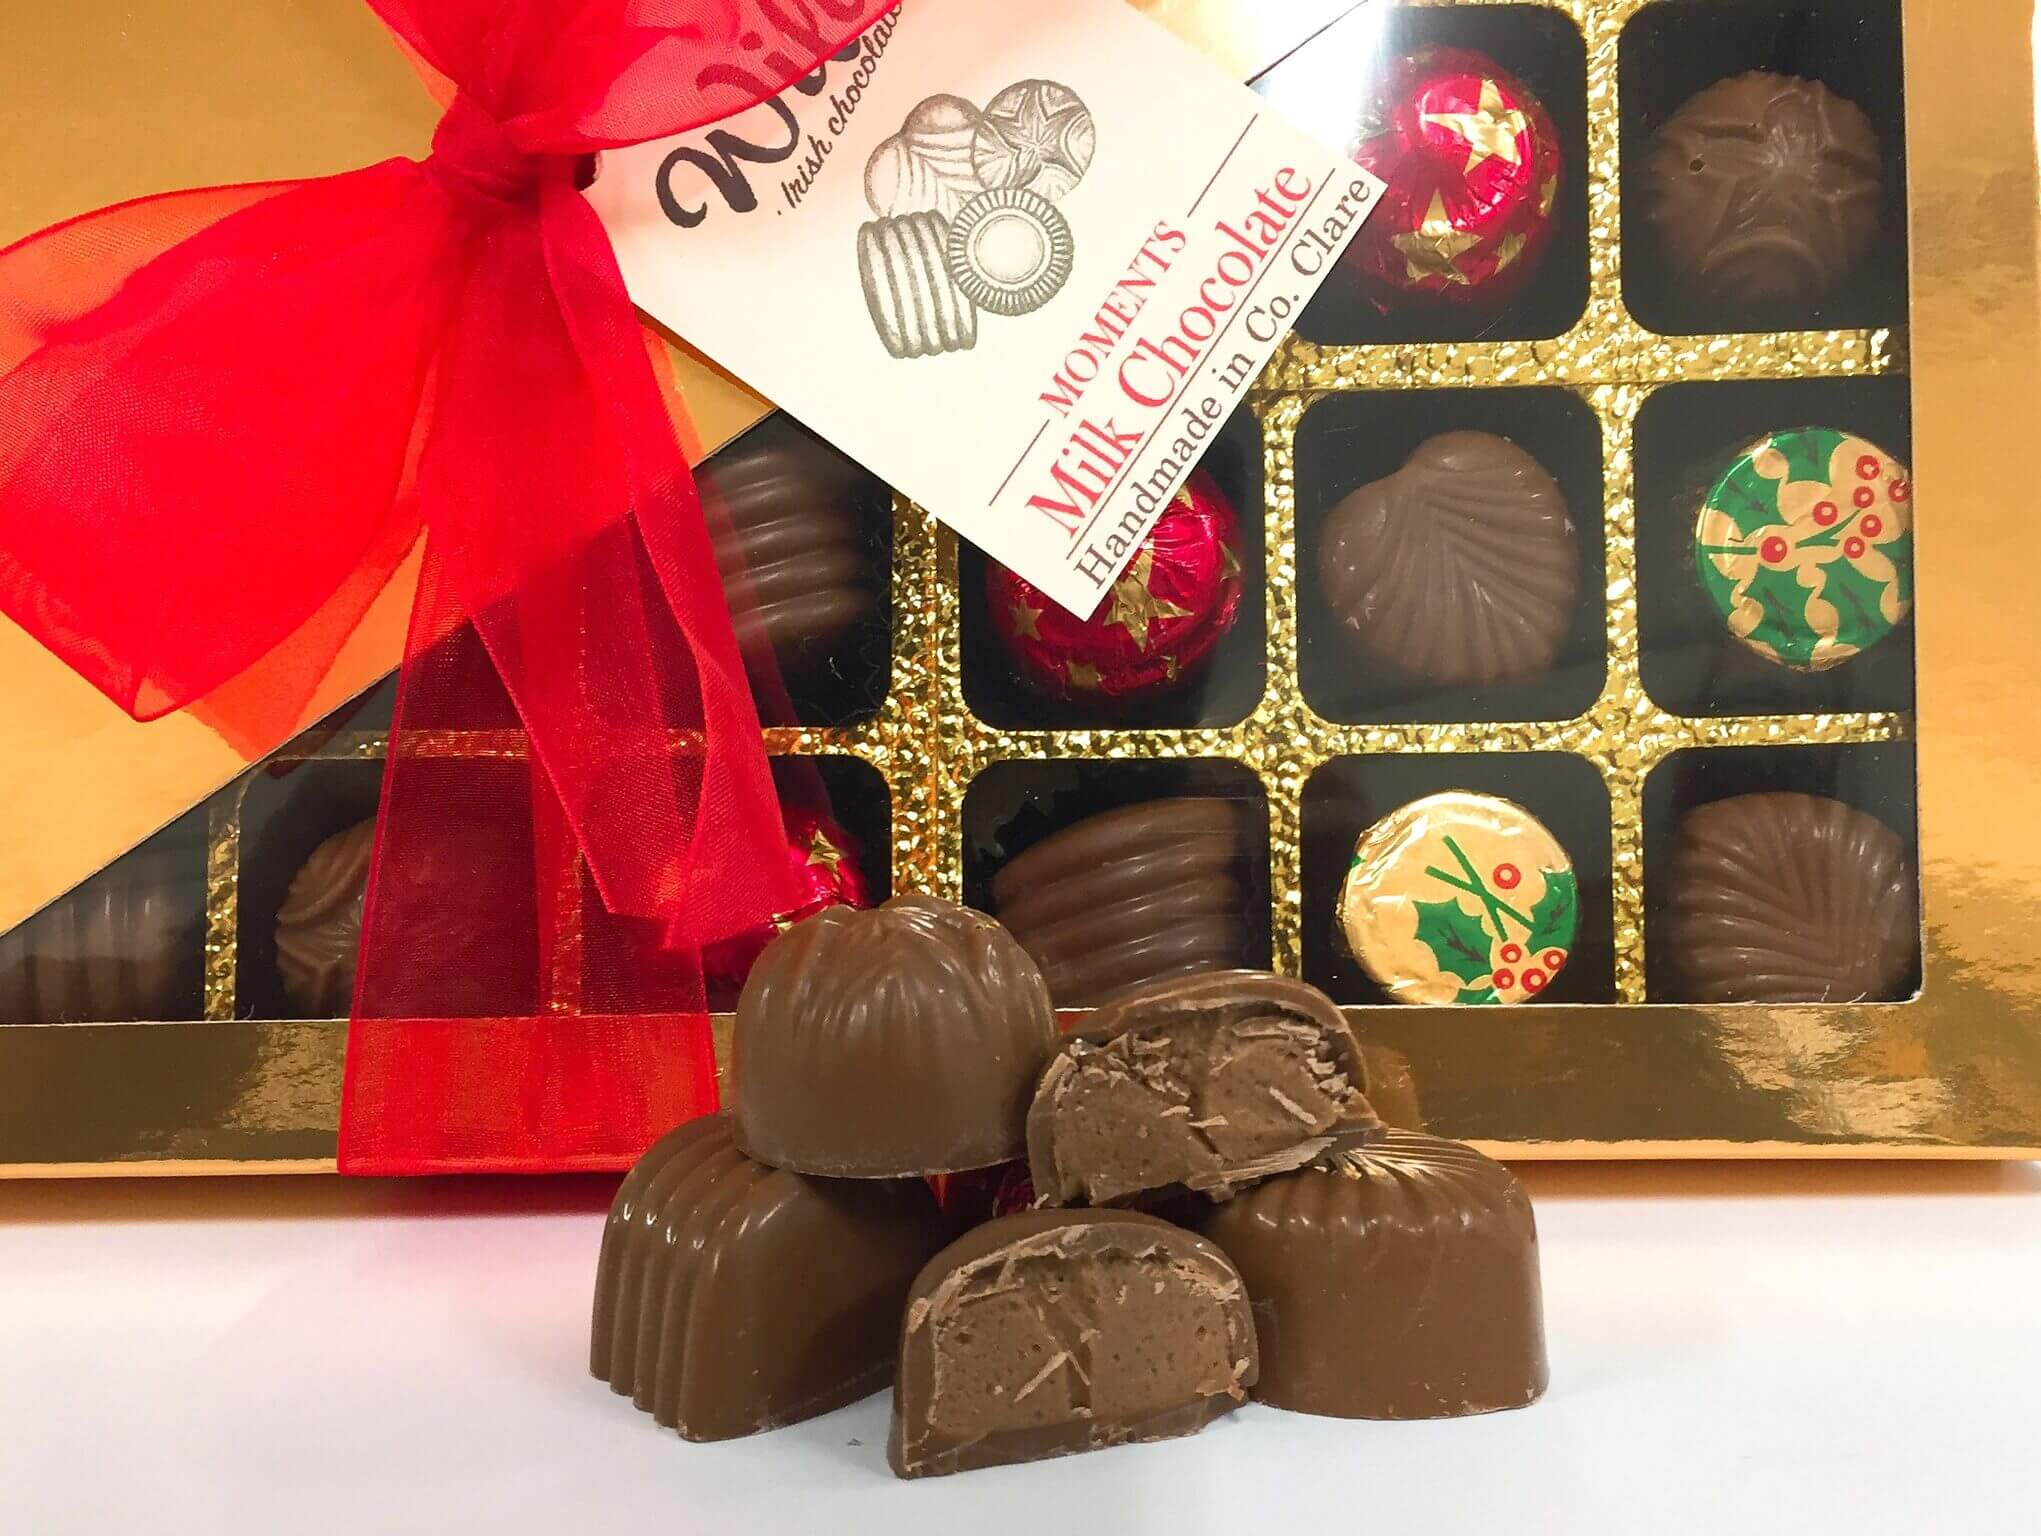 Moments 24 Milk Chocolate Selection Box Image - Wilde Irish Chocolates